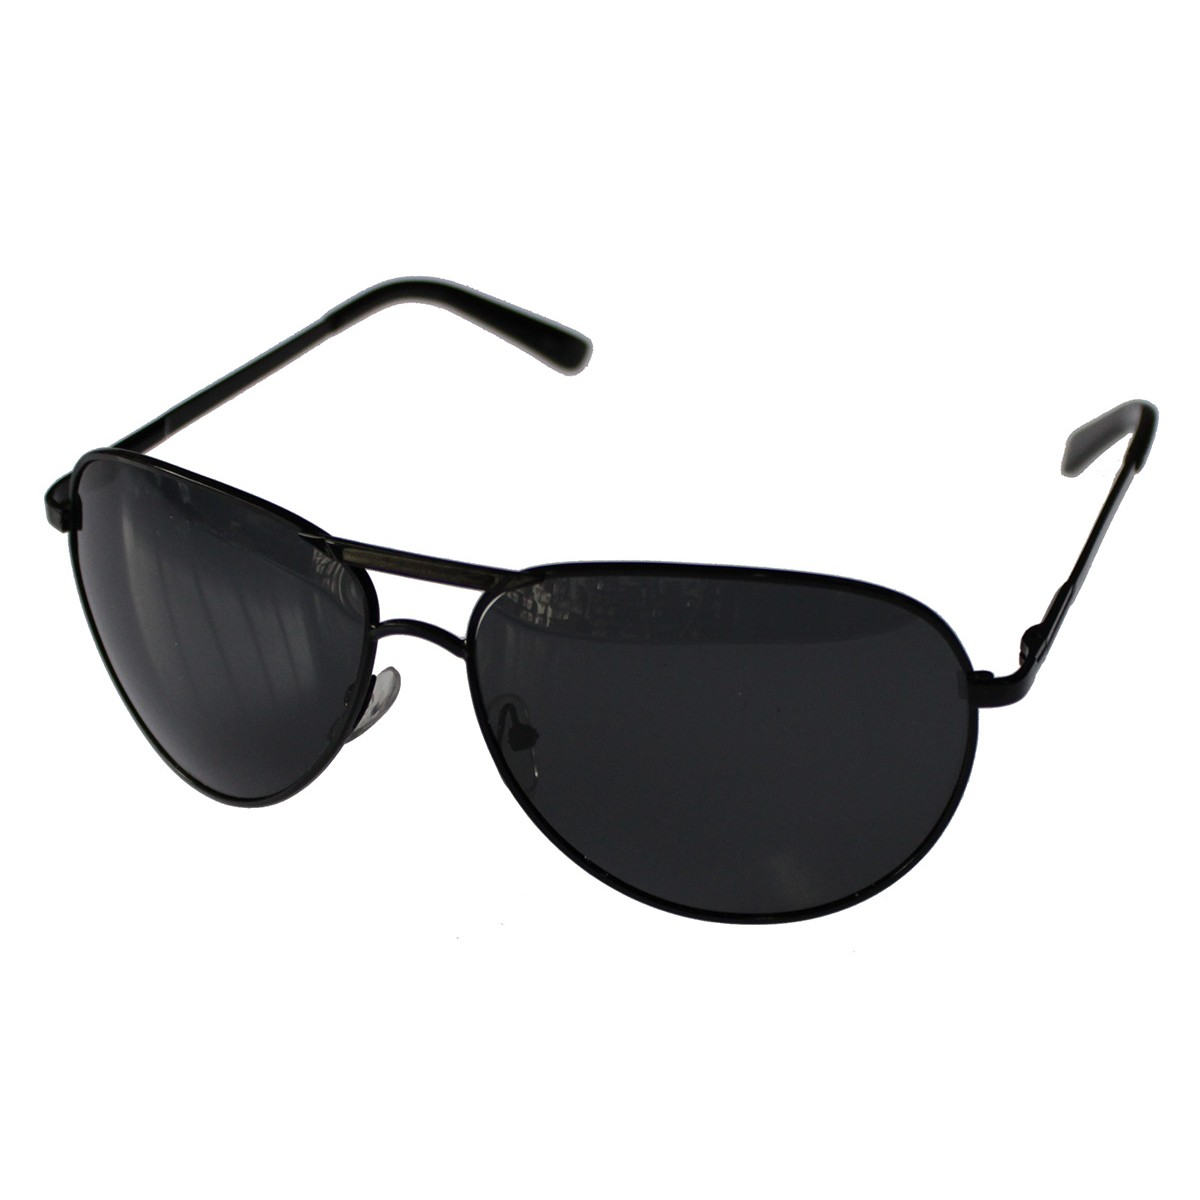 Поляризиращи риболовни очила мод. 214